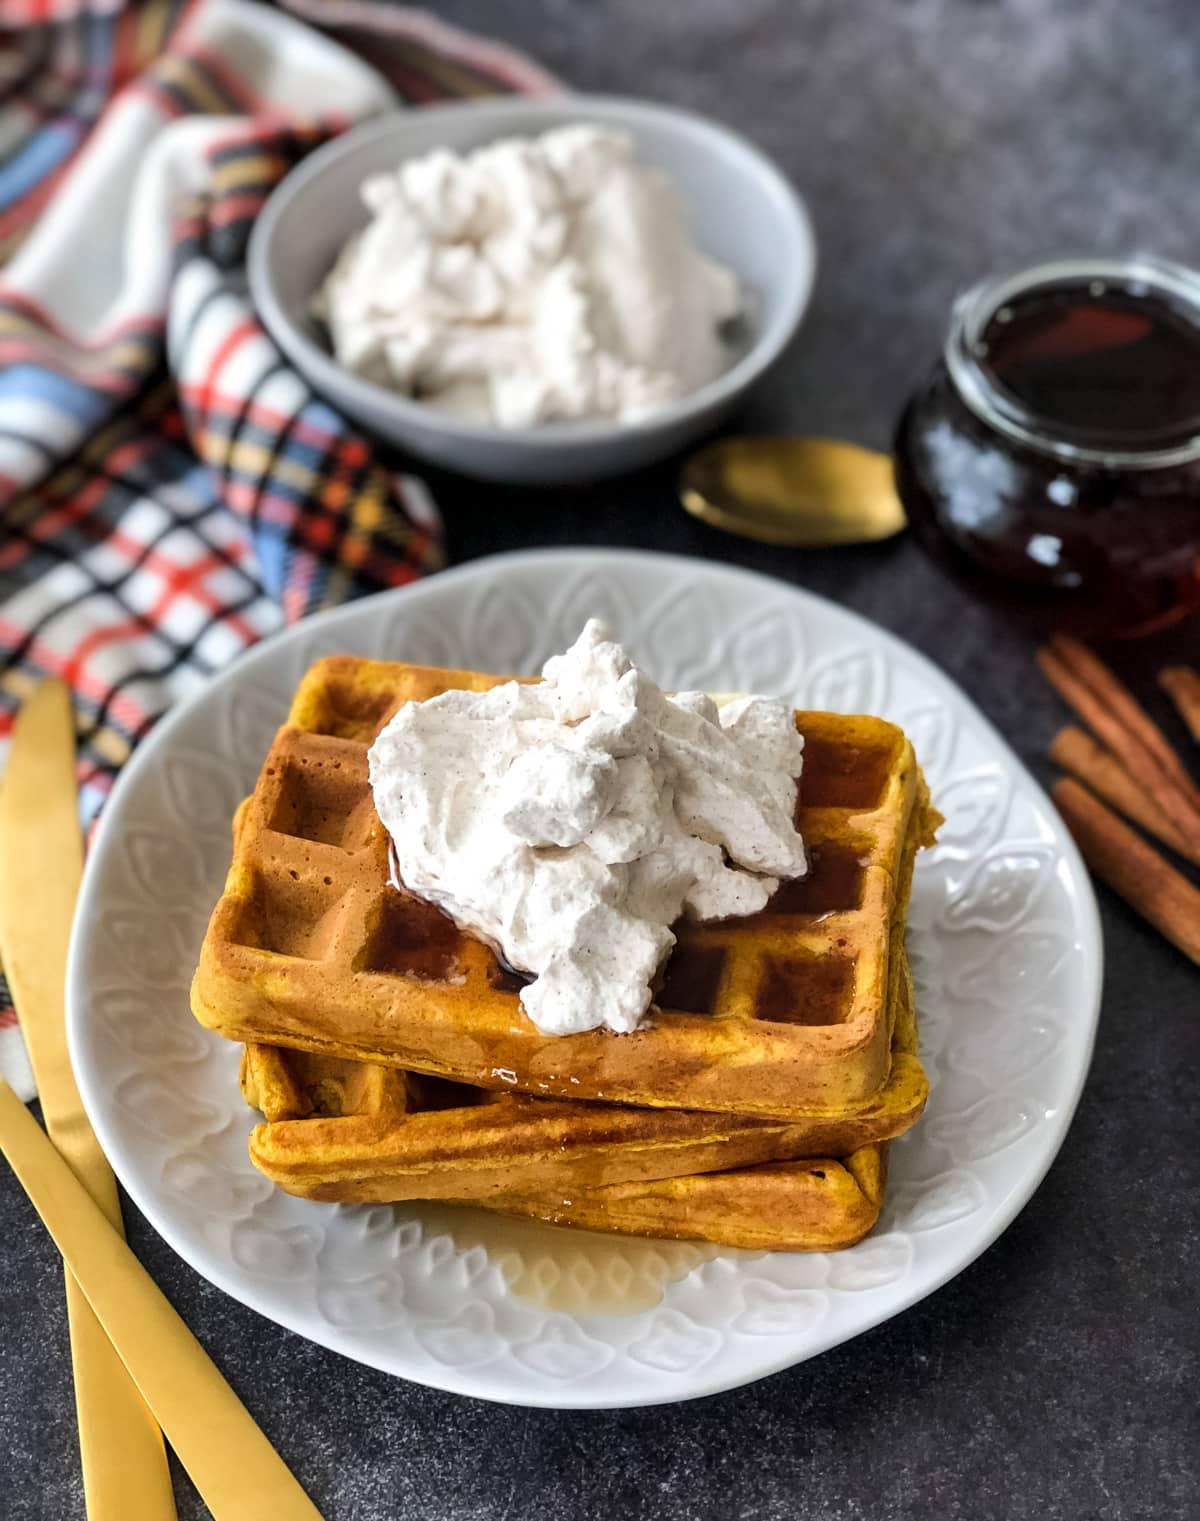 Pumpkin Pie Waffles with Cinnamon Whipped Cream